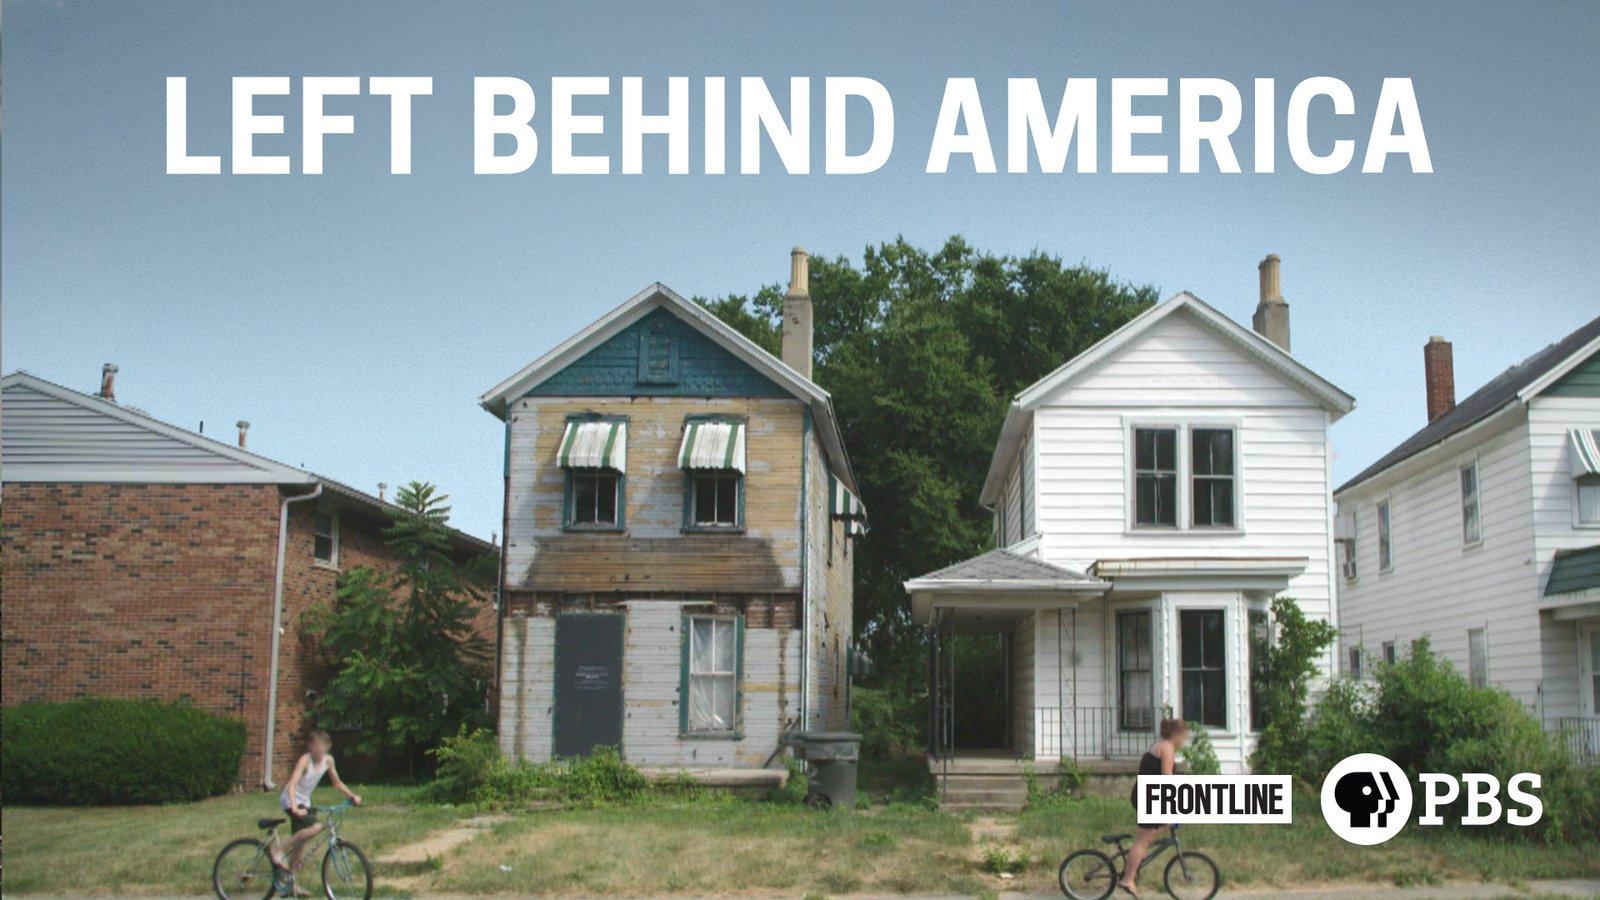 Frontline: Left Behind America - Ohio Citizens Fight for Economic Revitalization